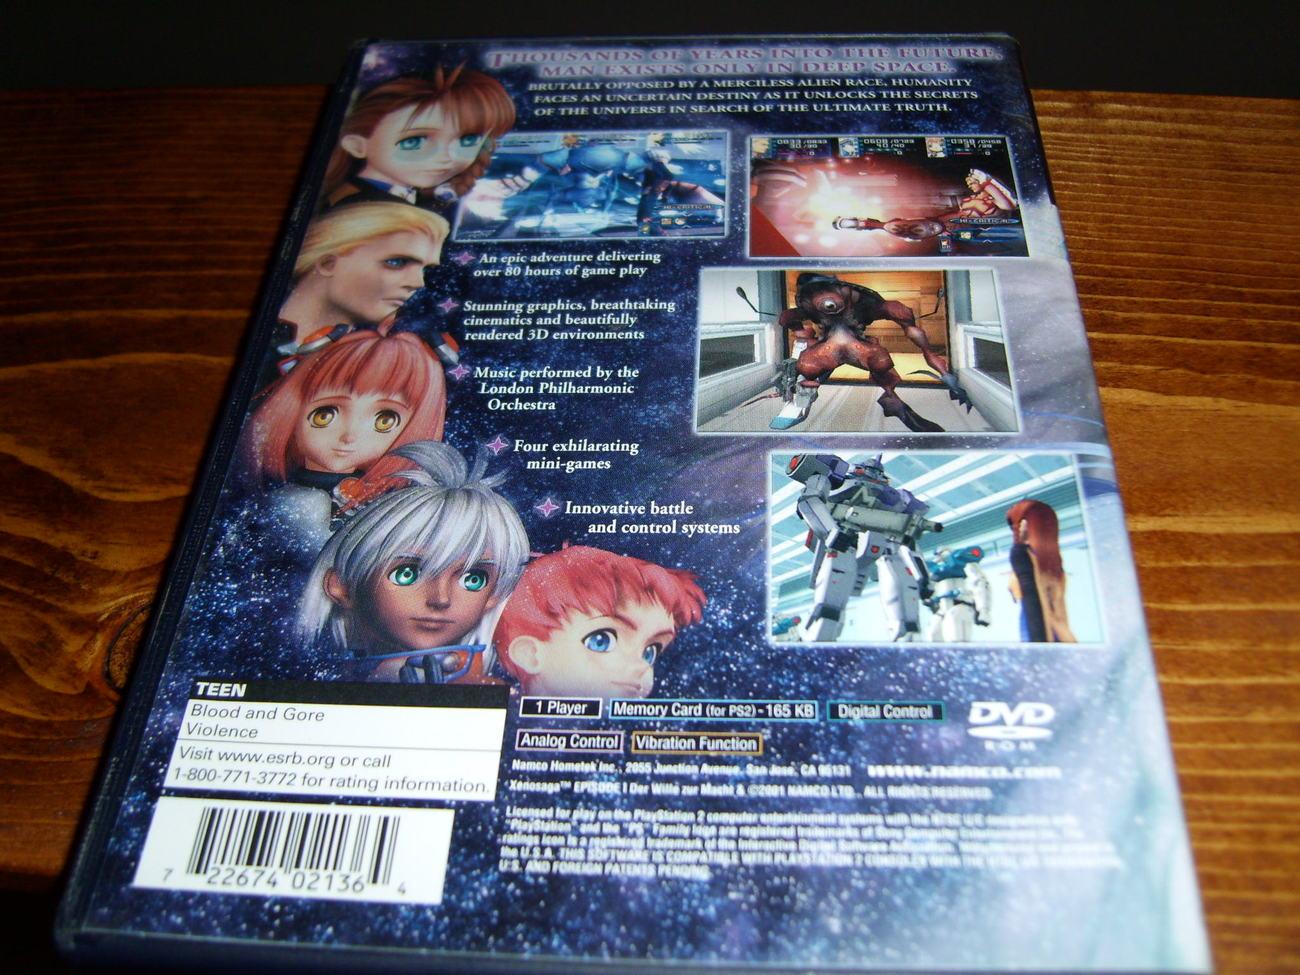 Xenosaga Episode 1 Playstation 2 game PS2